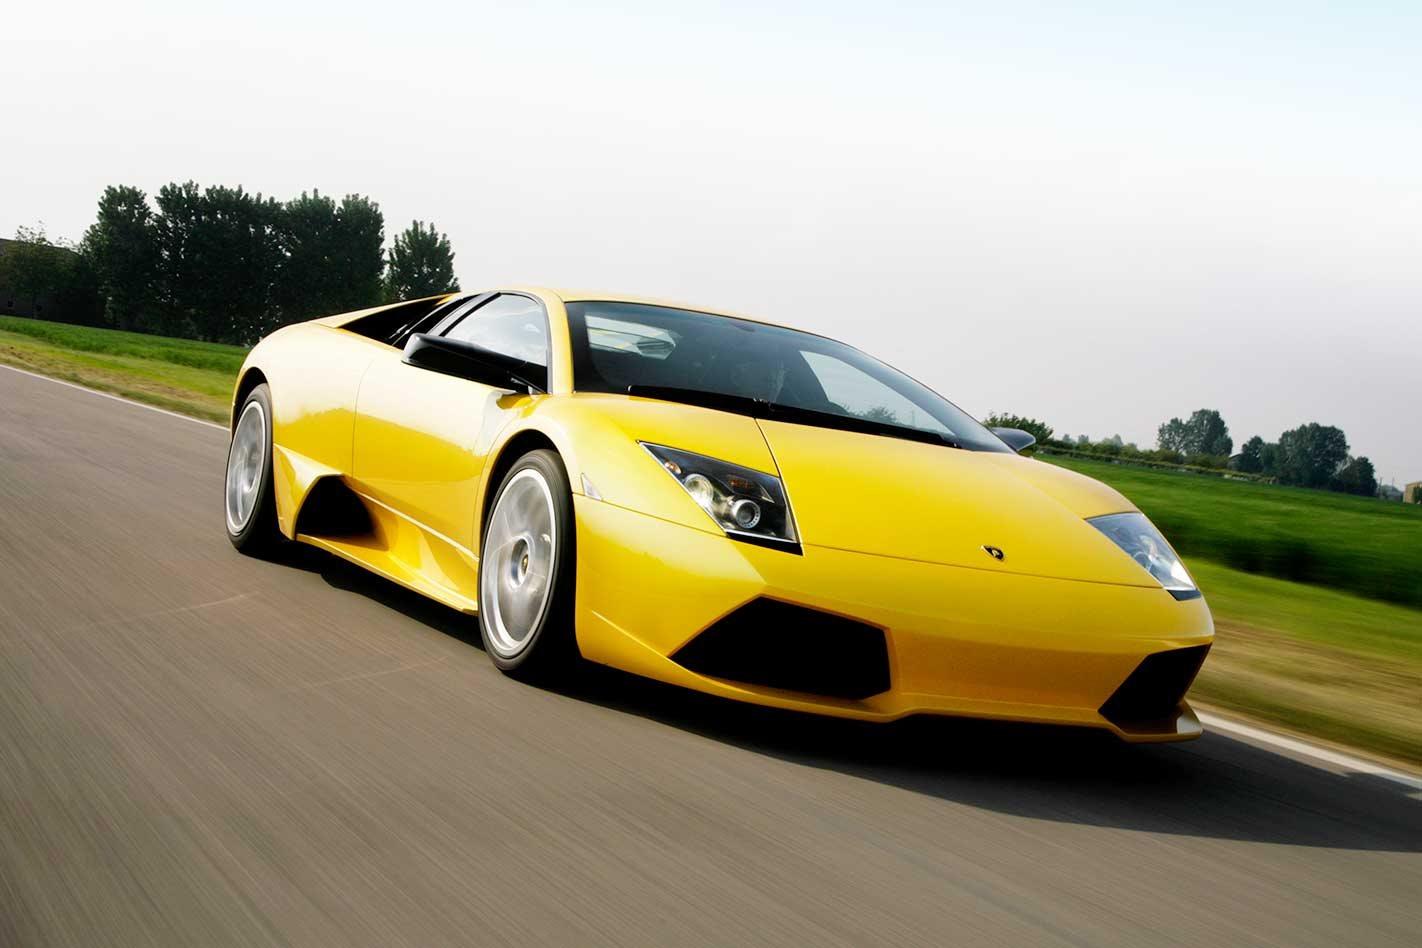 2006 Lamborghini Murcielago Lp640 Review Classic Motor